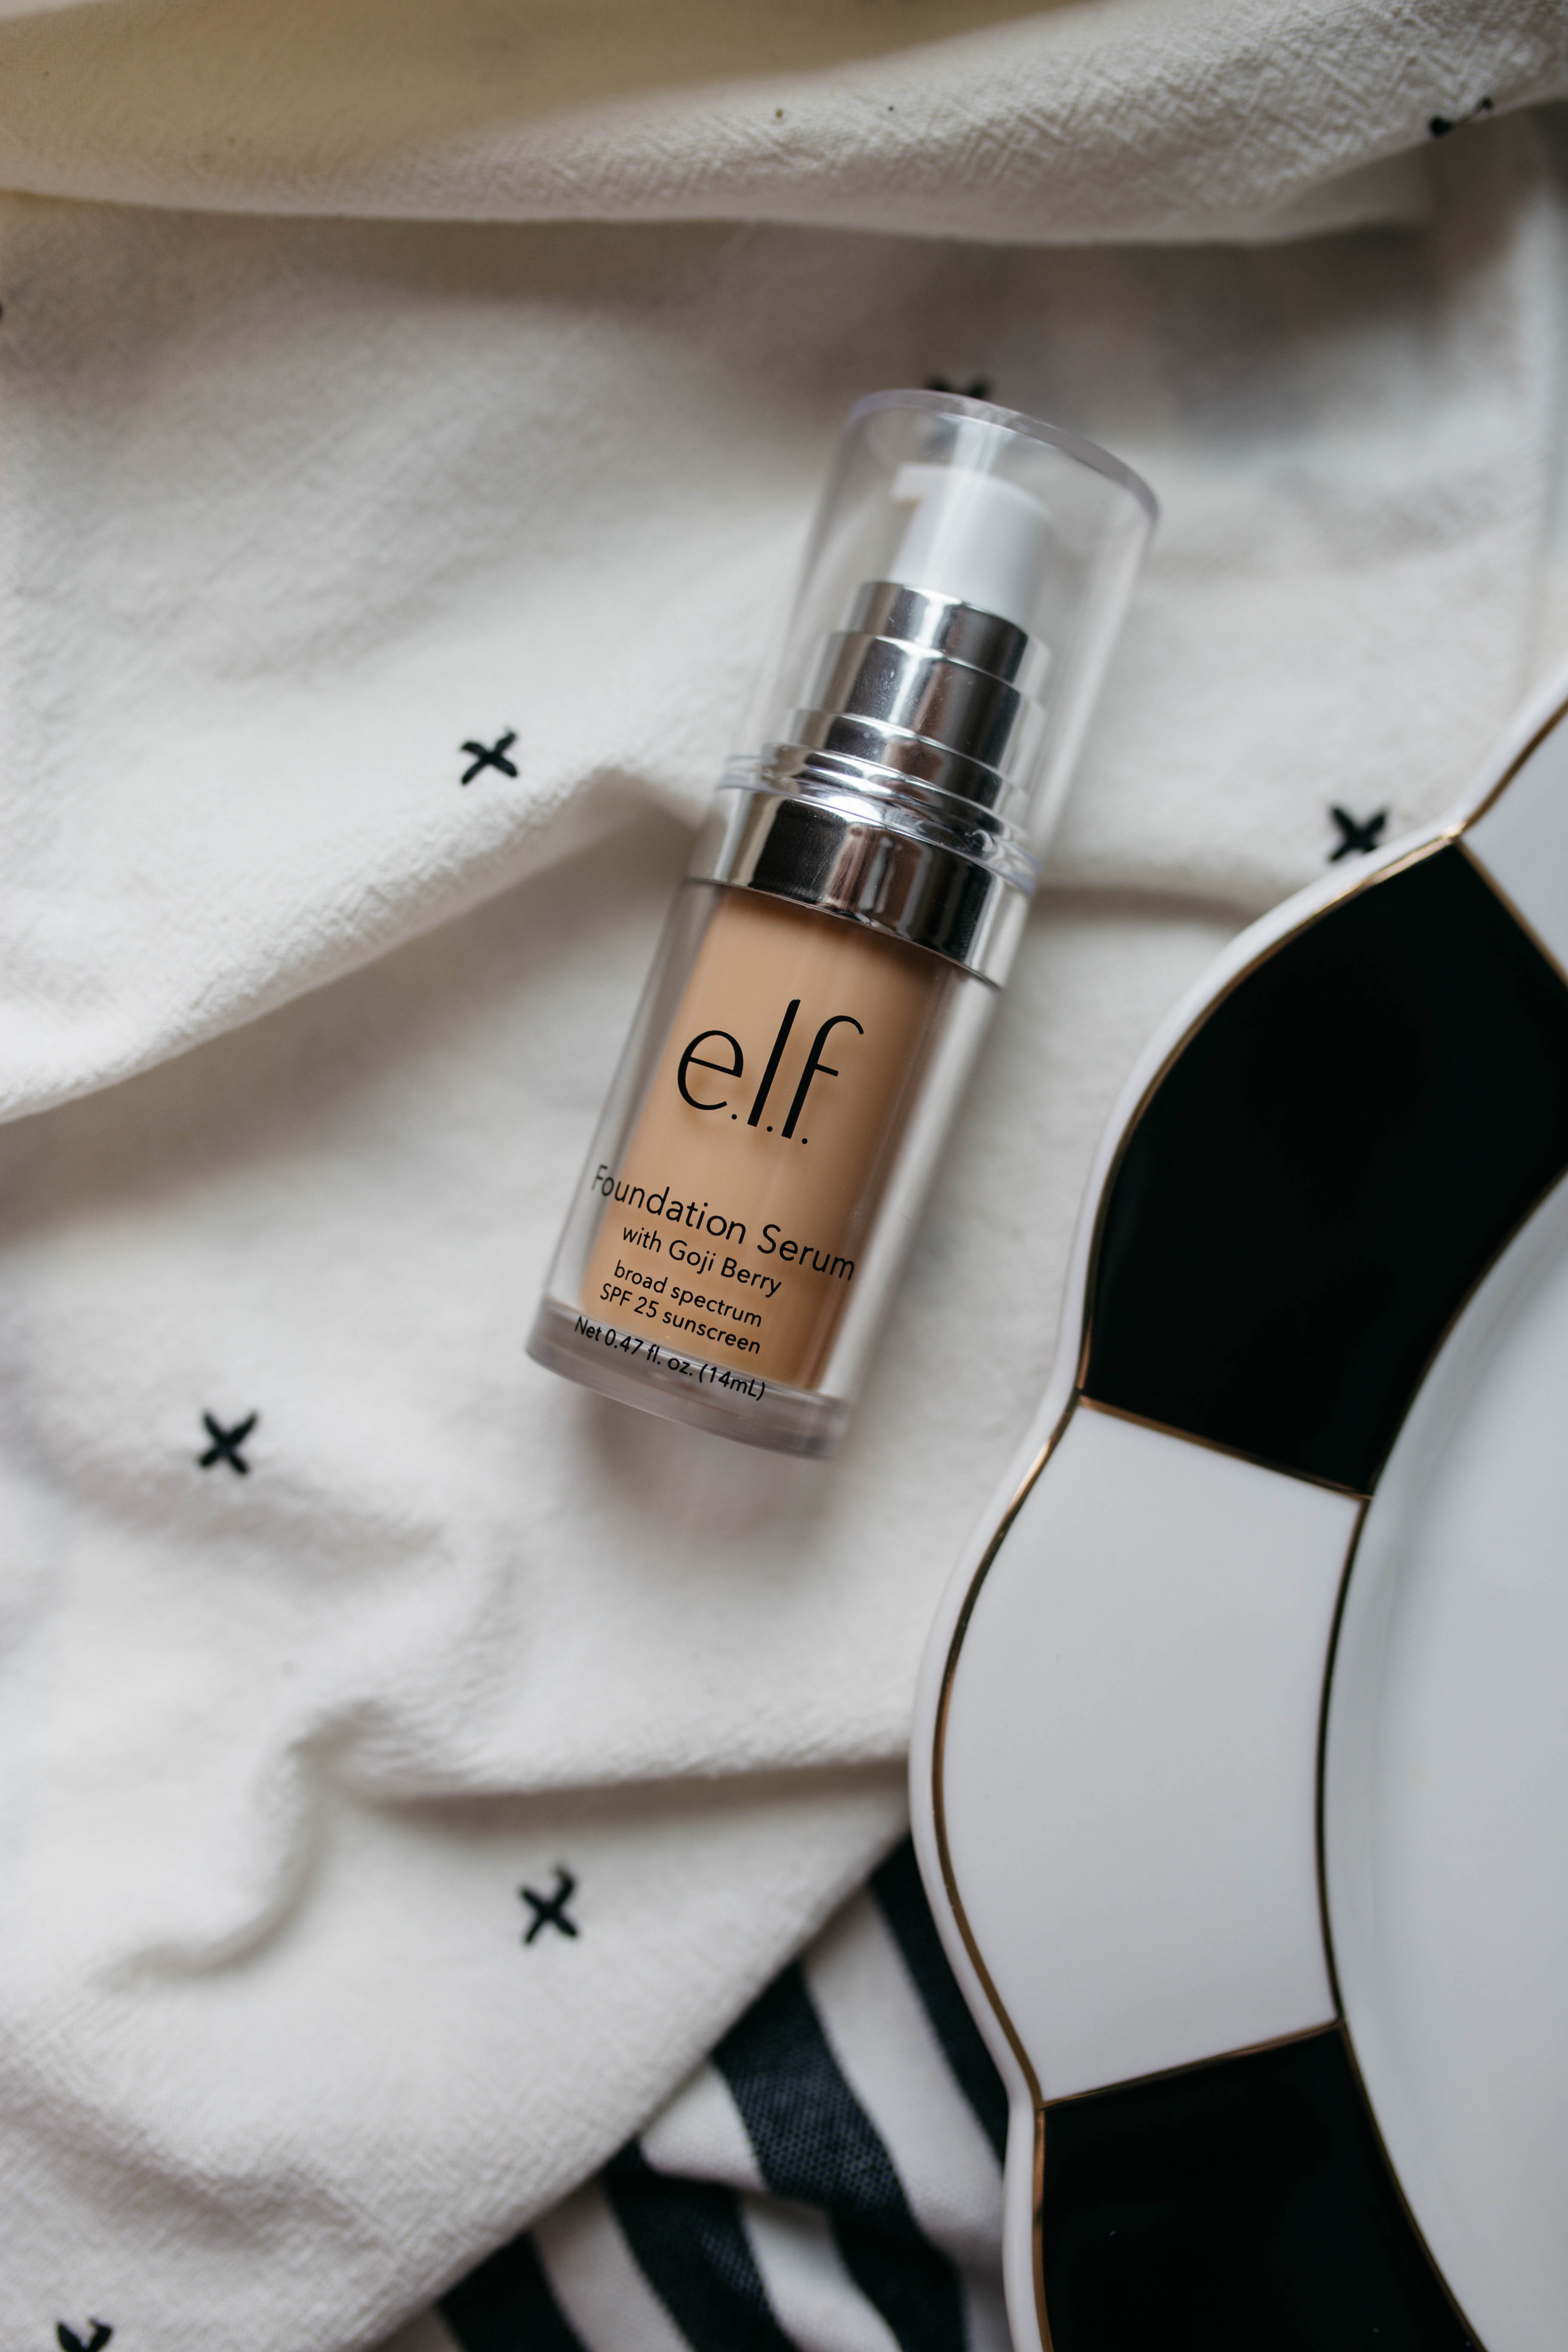 e.l.f foundation serum